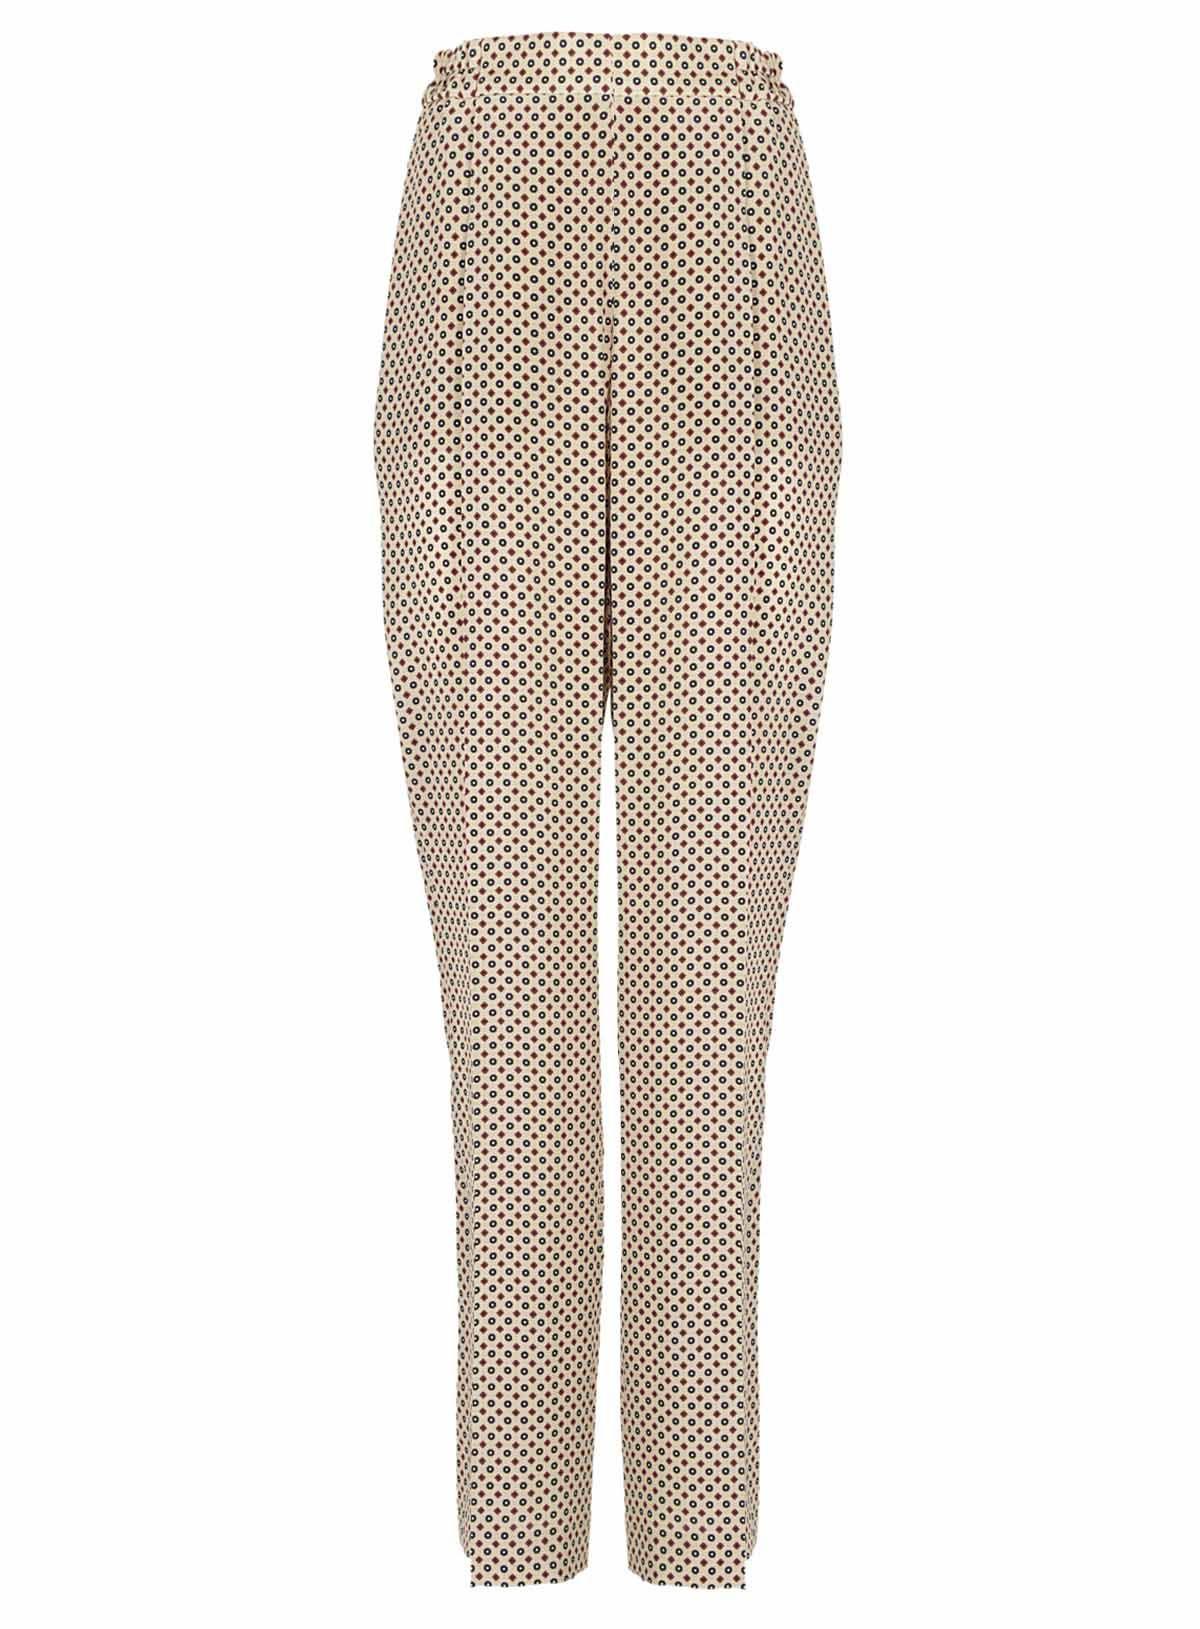 Stella Mccartney Silk Trousers